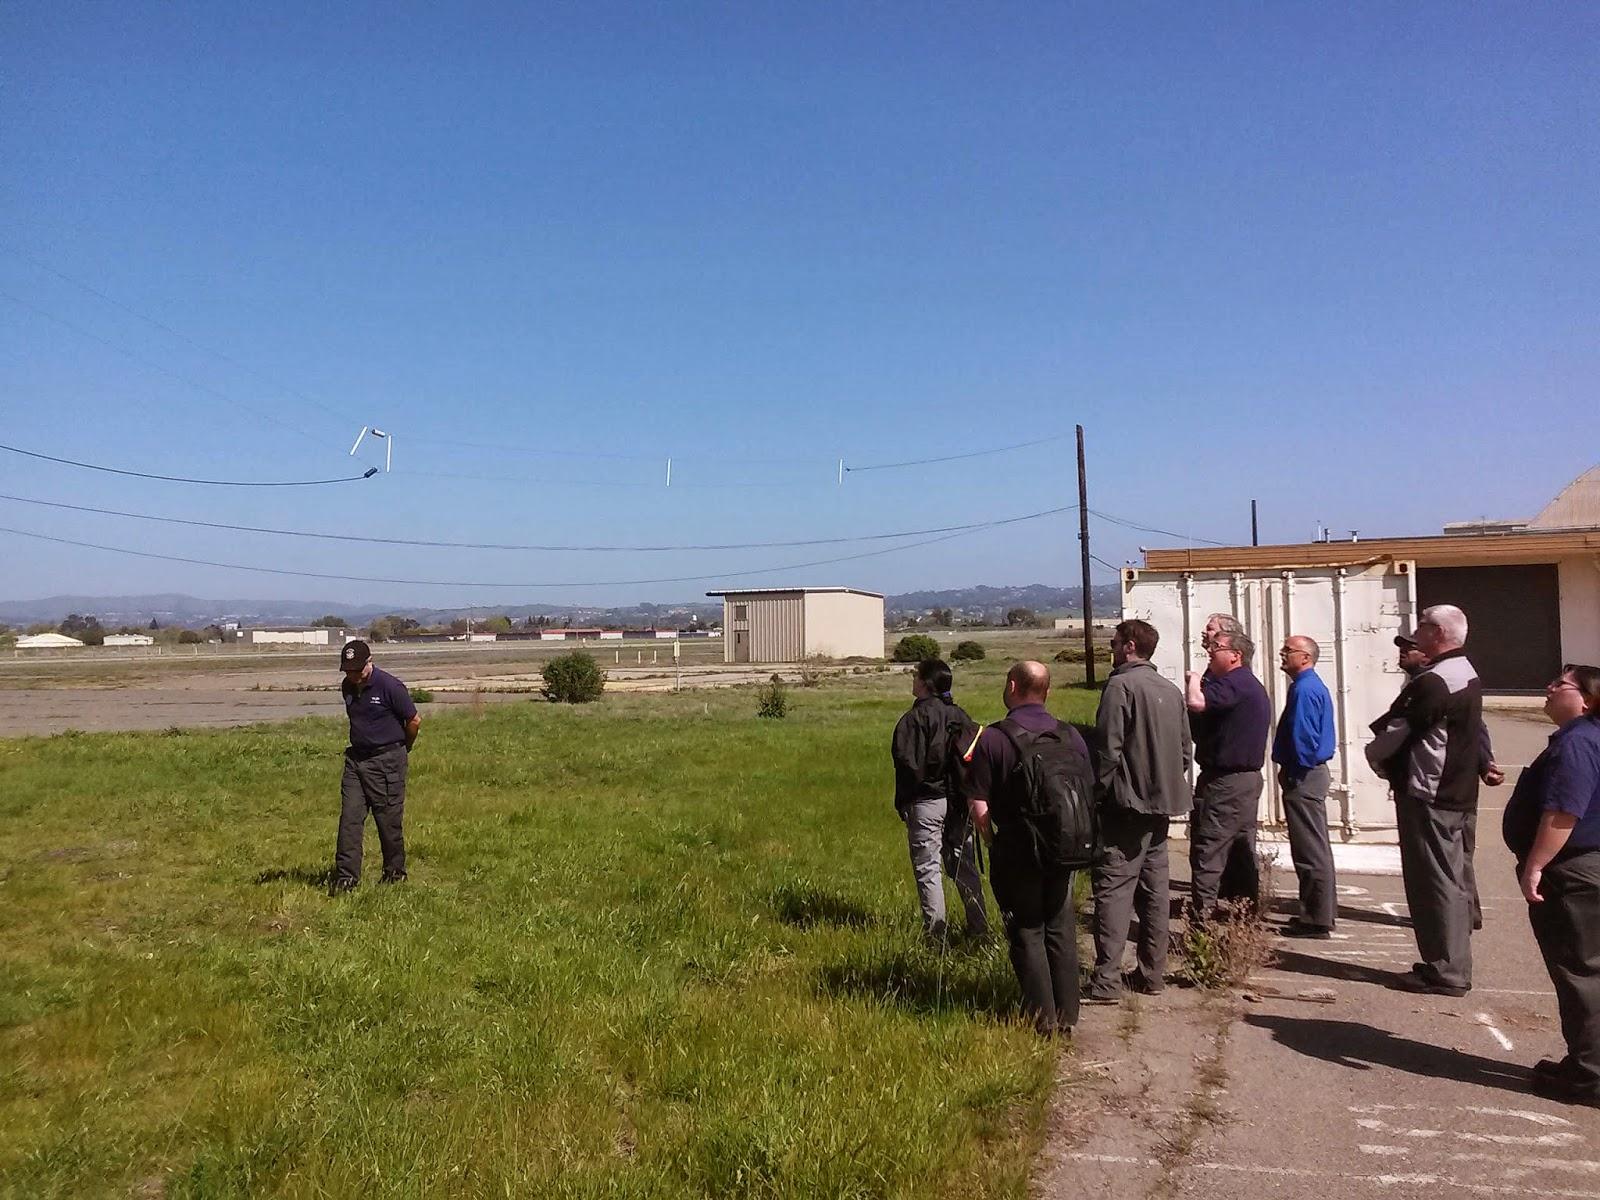 Squadron 188 - The Logbook: March 2014 - HF Radio Training